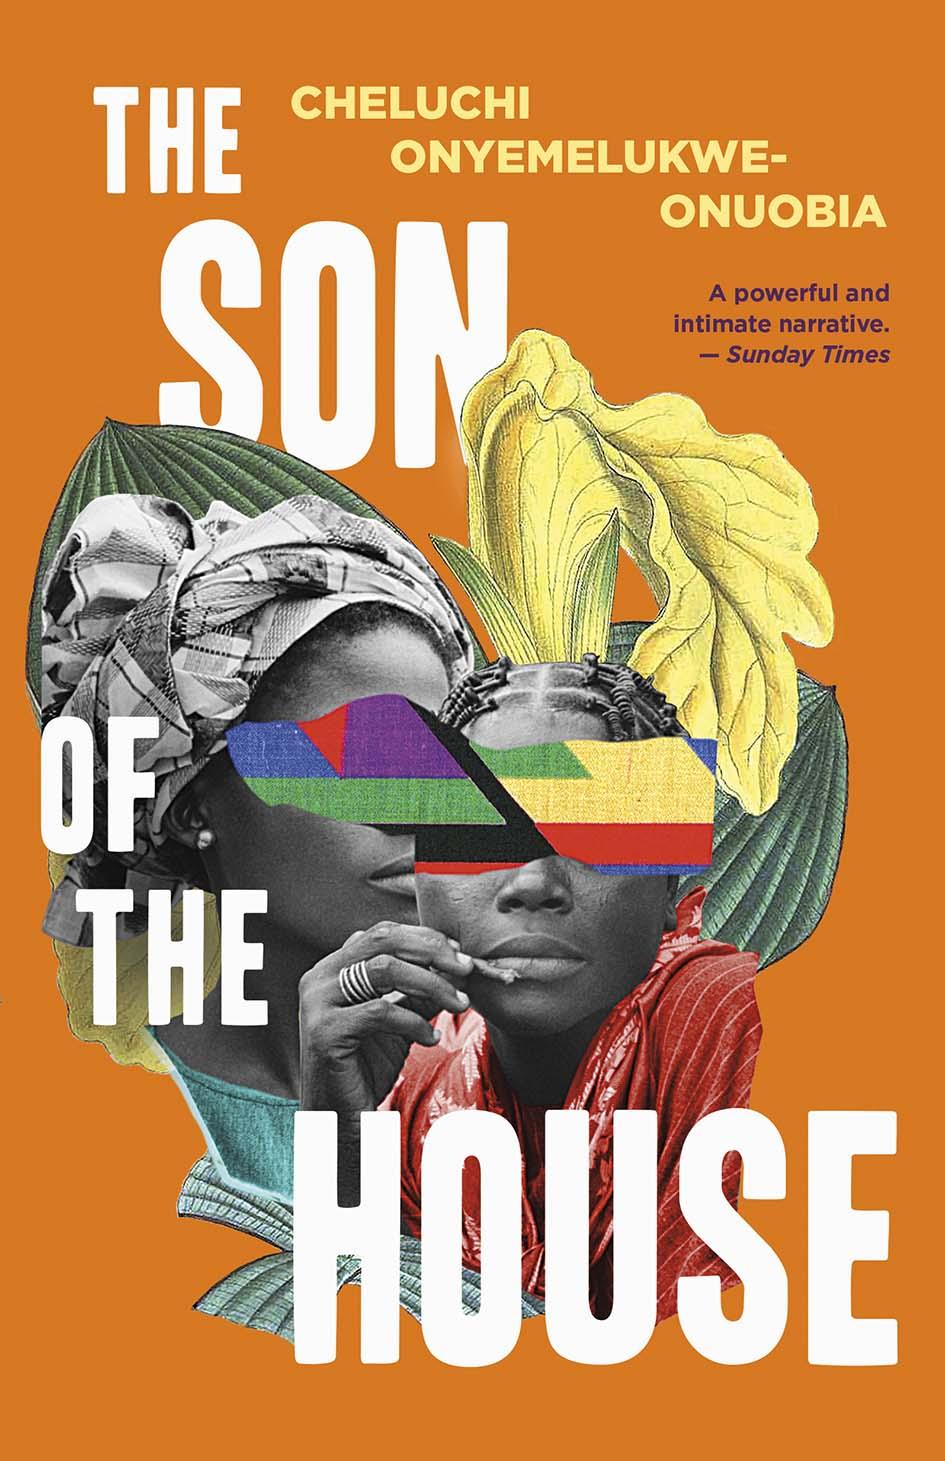 Son of the House by Cheluchi Onyemelukwe-Onuobia